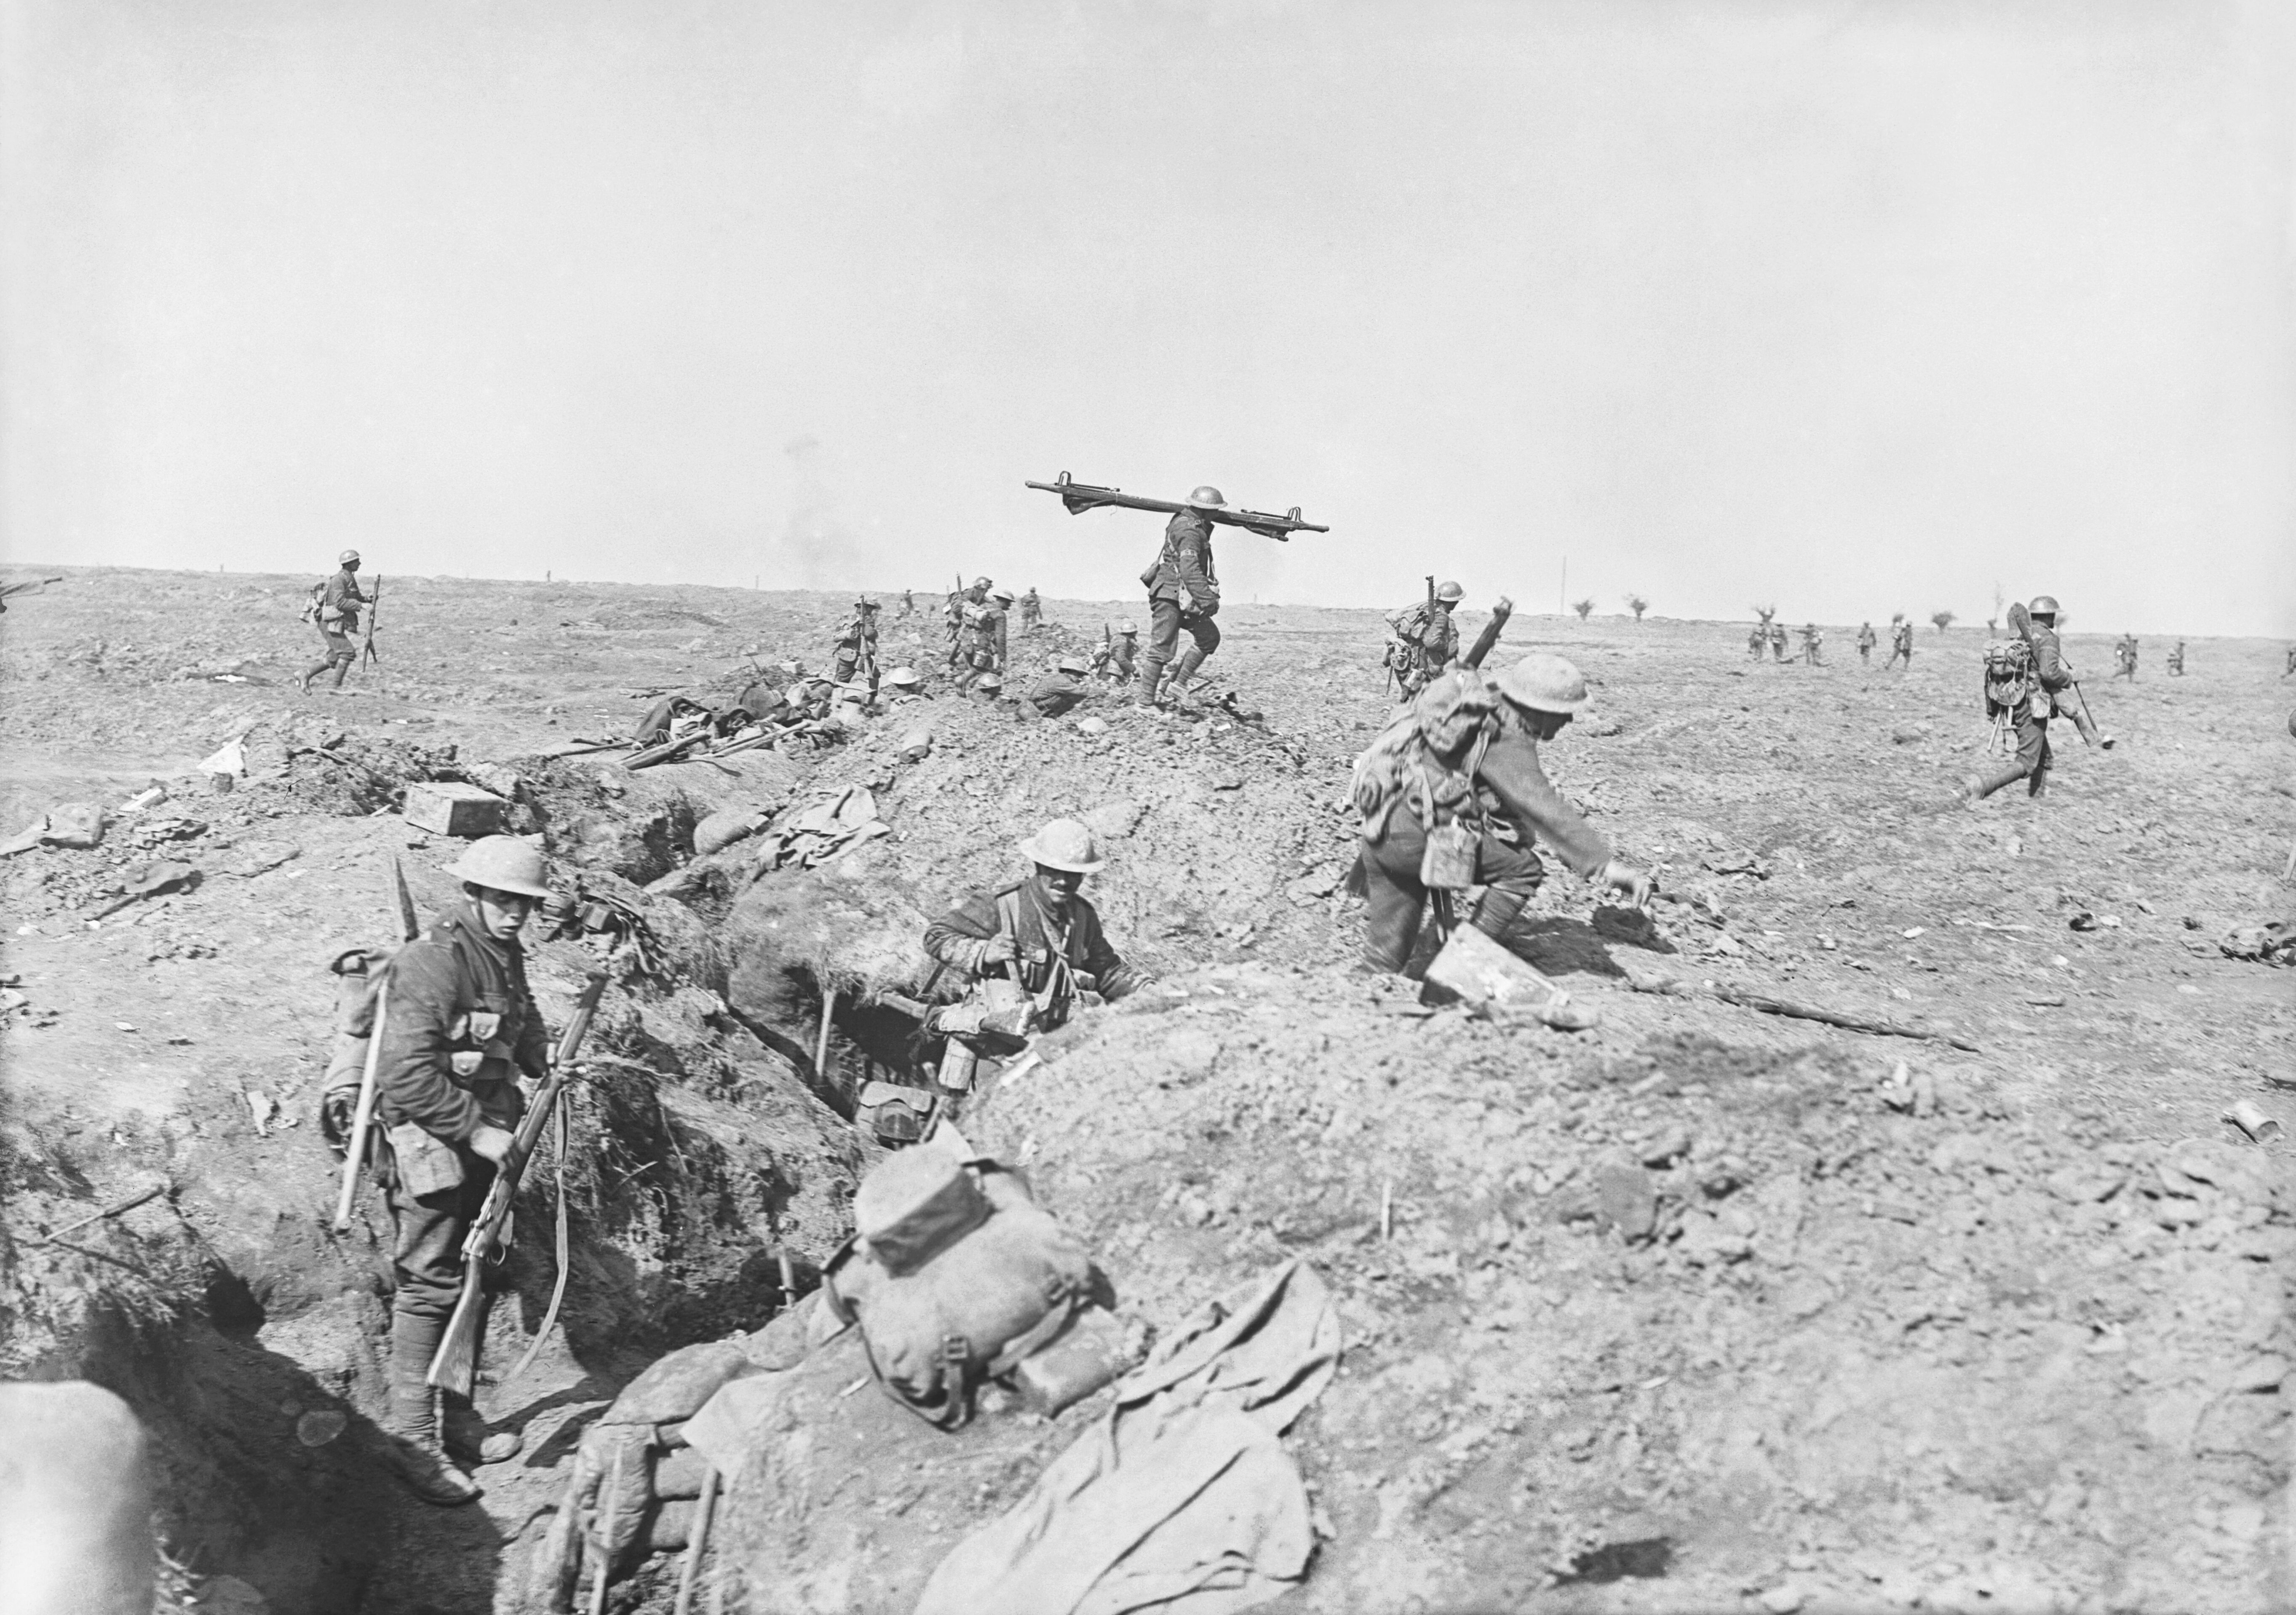 Batalha do somme military history ww1 history modern history british history